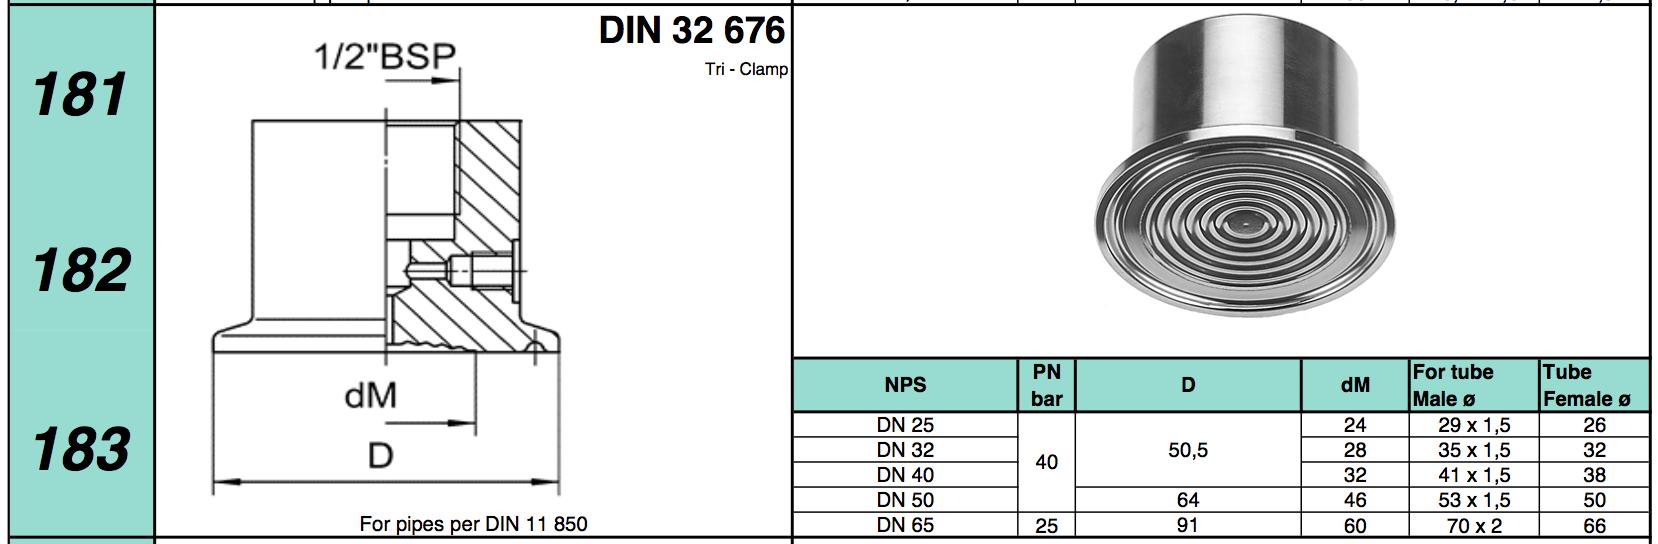 chuẩn kết nối dạng tri clamp DIN 32 676